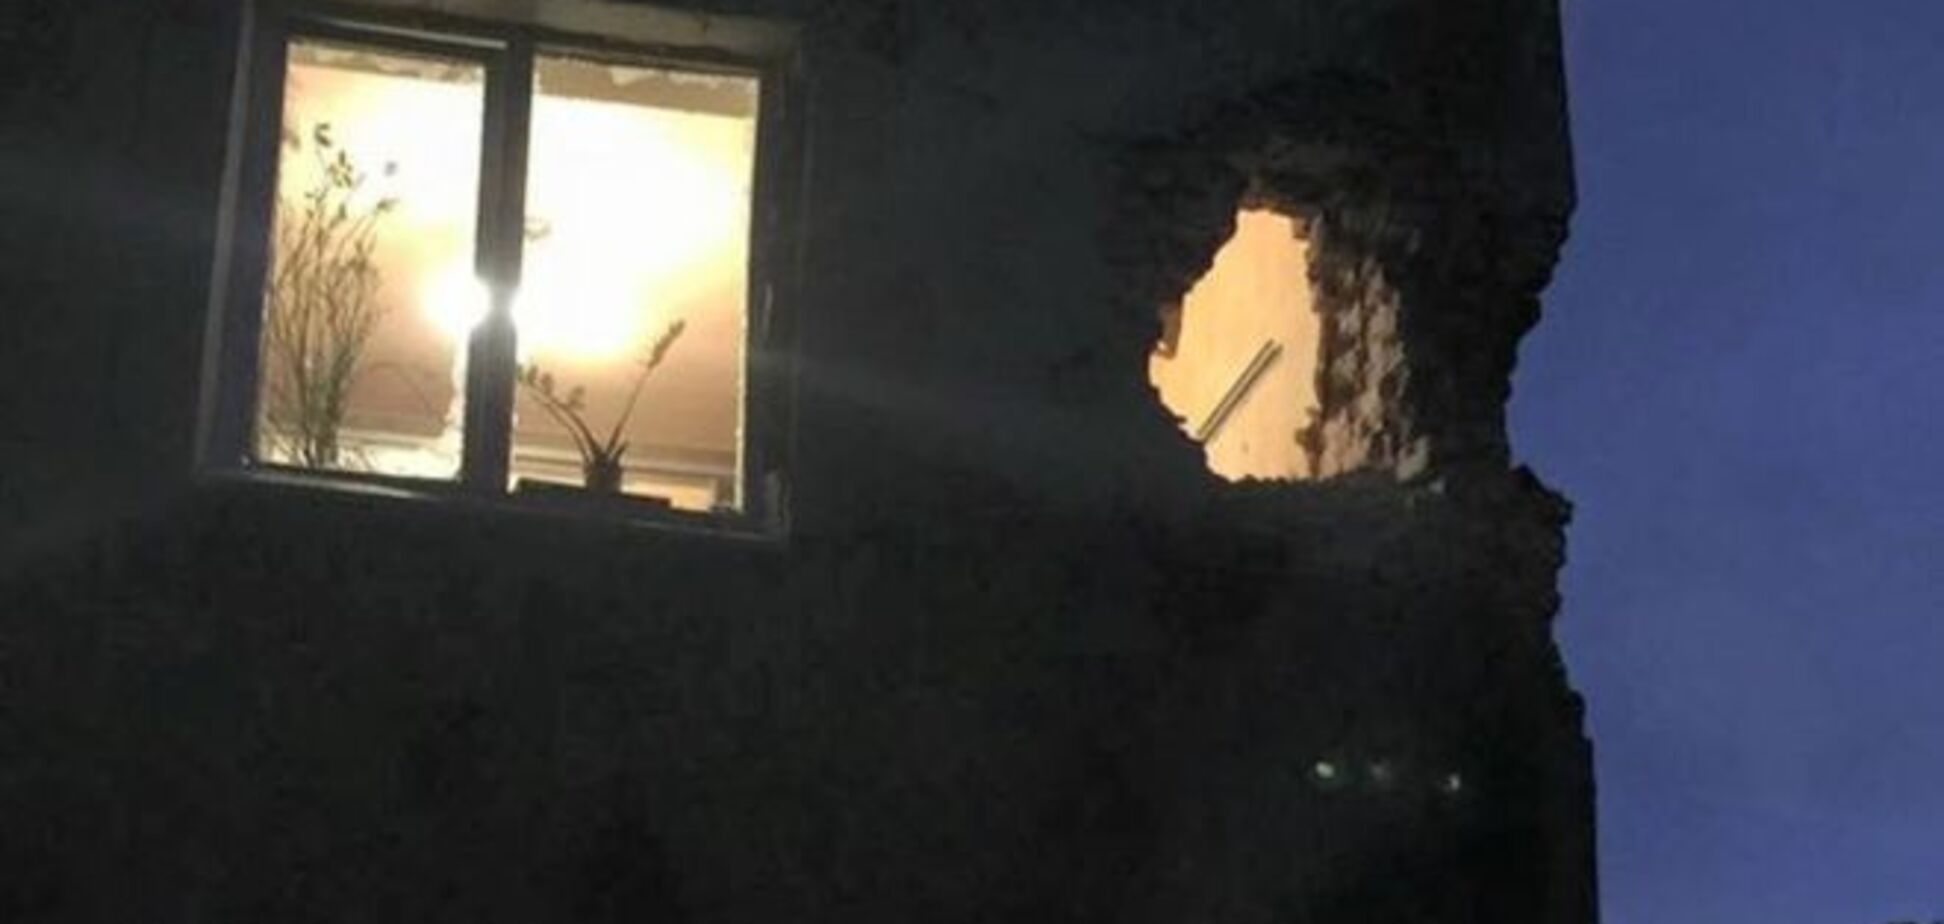 В Донецке снаряд прилетел прямо в жилую квартиру: фотофакт